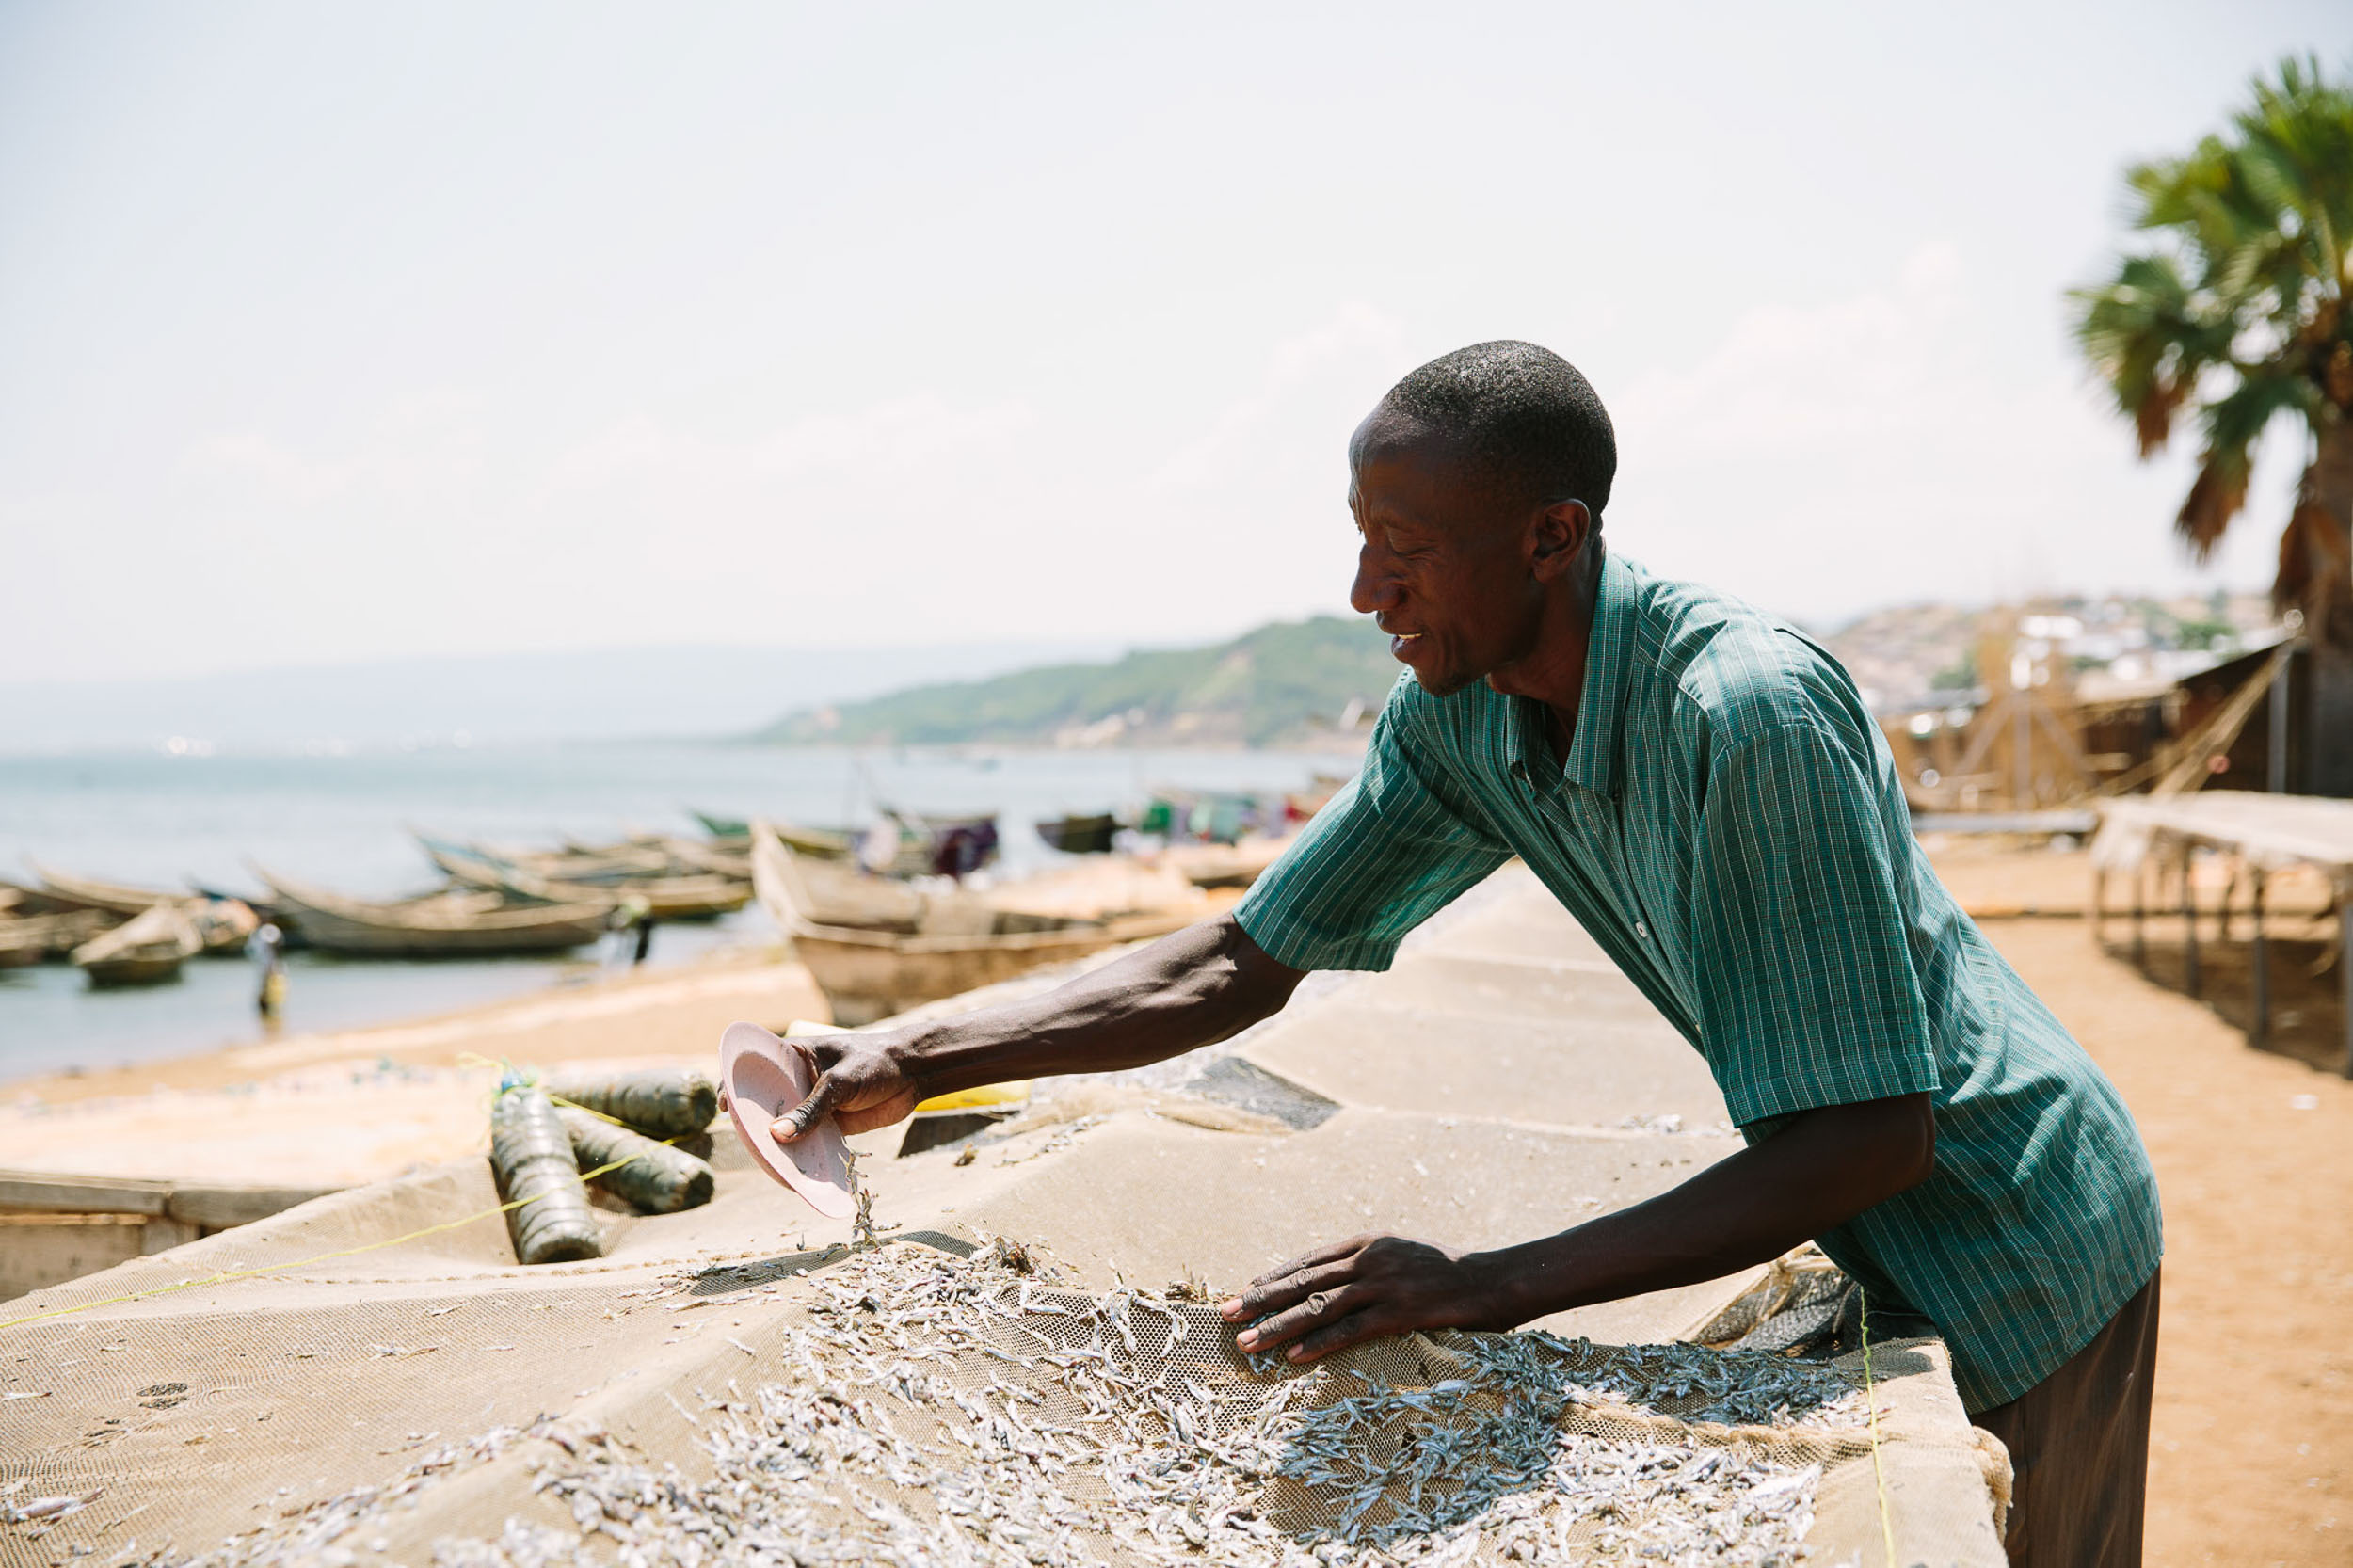 uganda-ajws-christine-han-photography-104.jpg